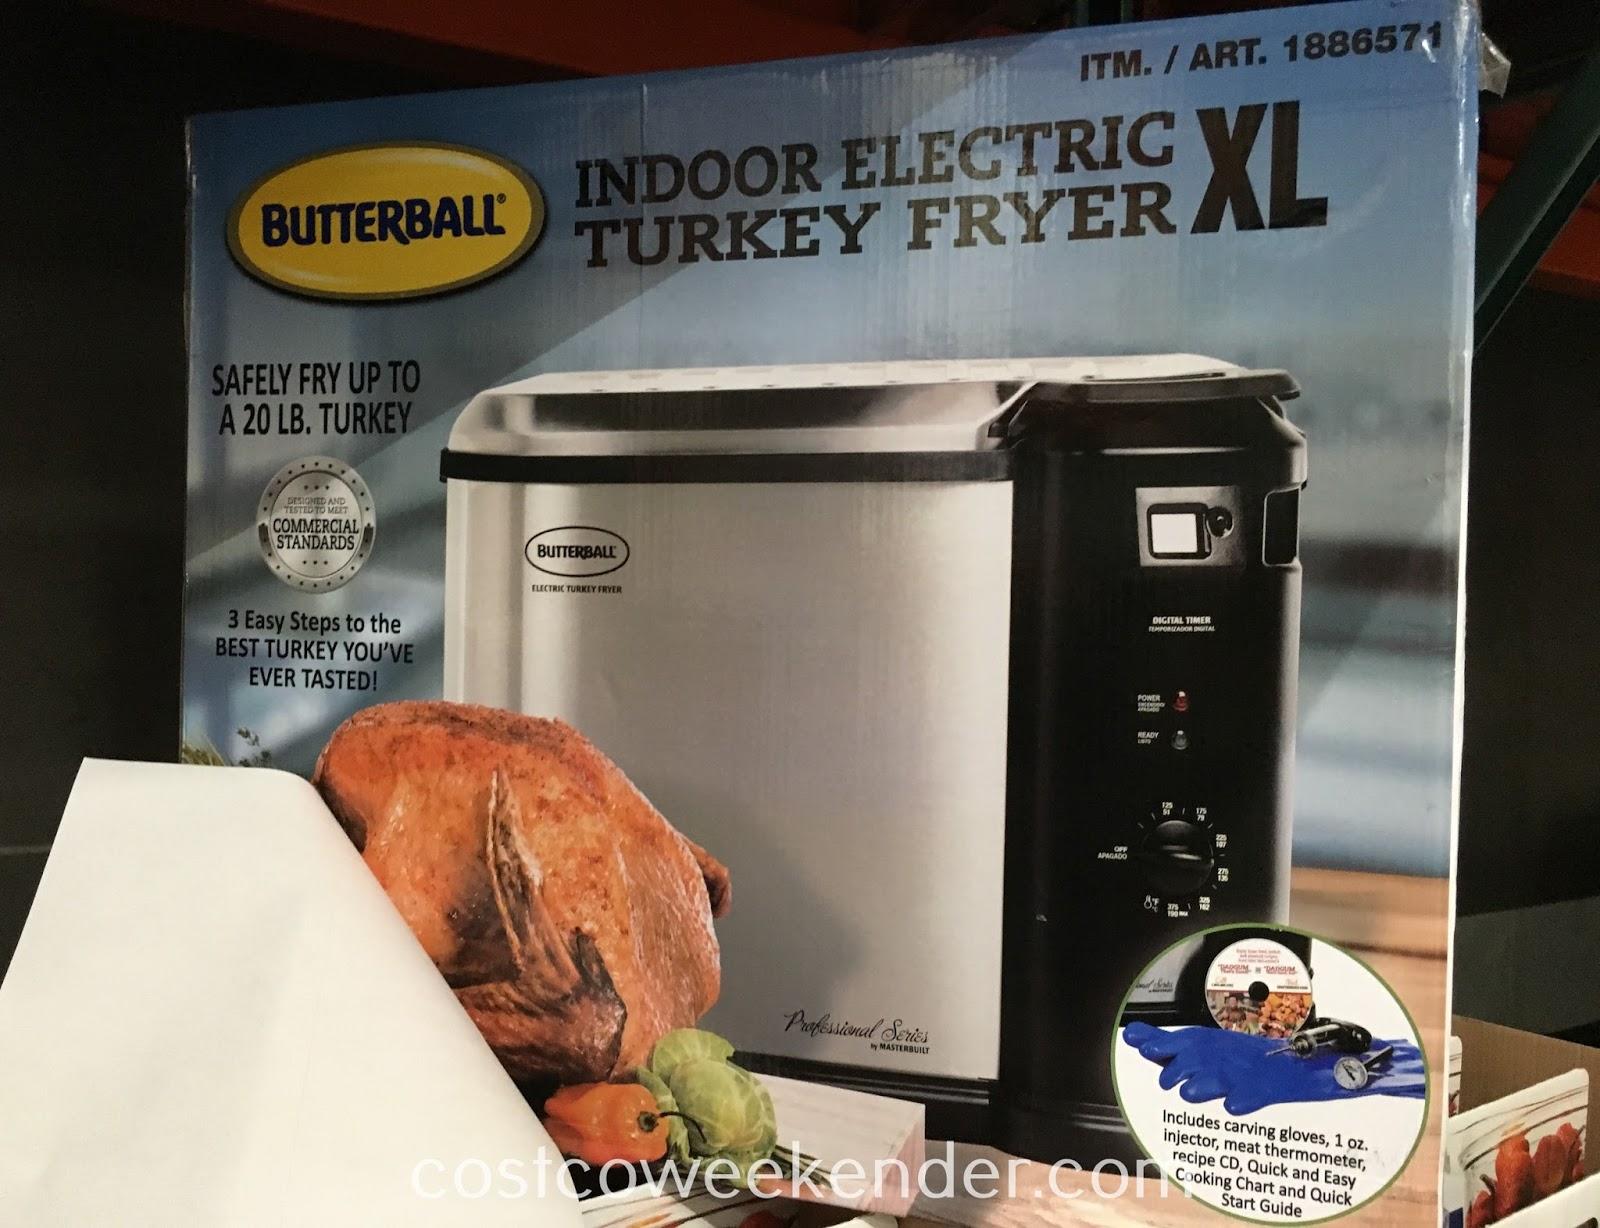 Butterball 23011815 Indoor Electric Turkey Fryer Xl